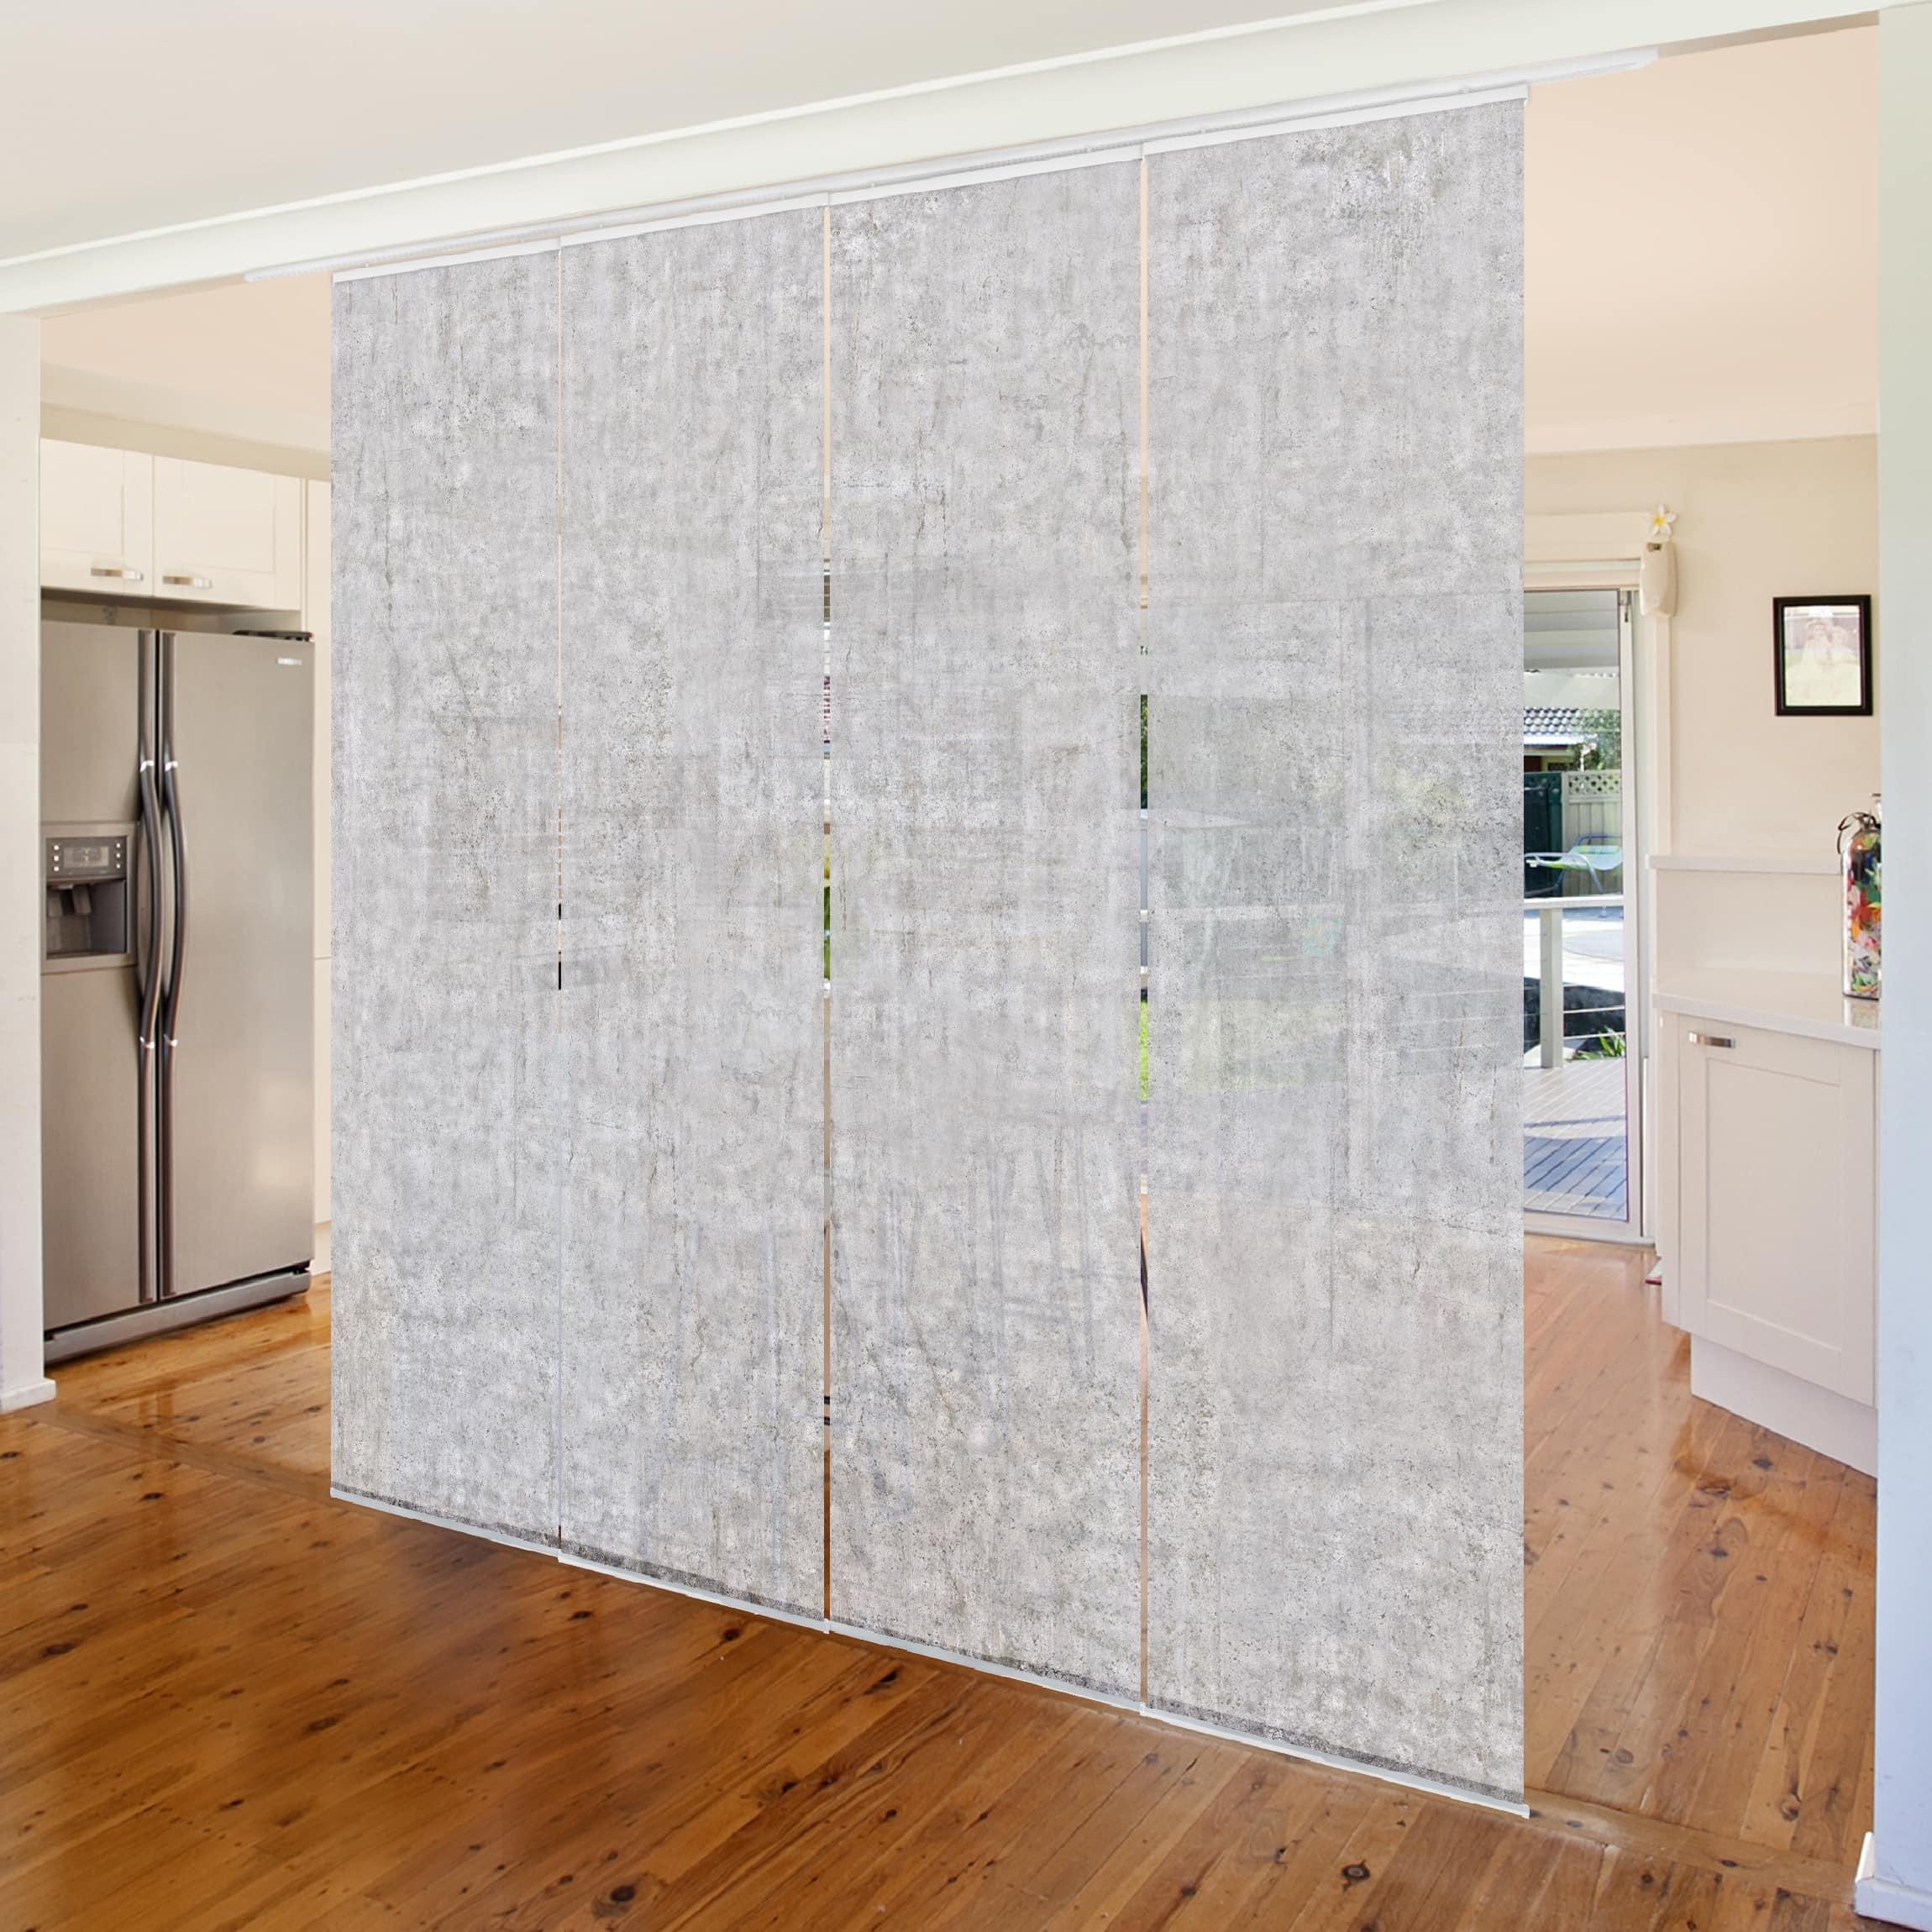 schiebegardinen set beton cir tapete 4 fl chenvorh nge. Black Bedroom Furniture Sets. Home Design Ideas